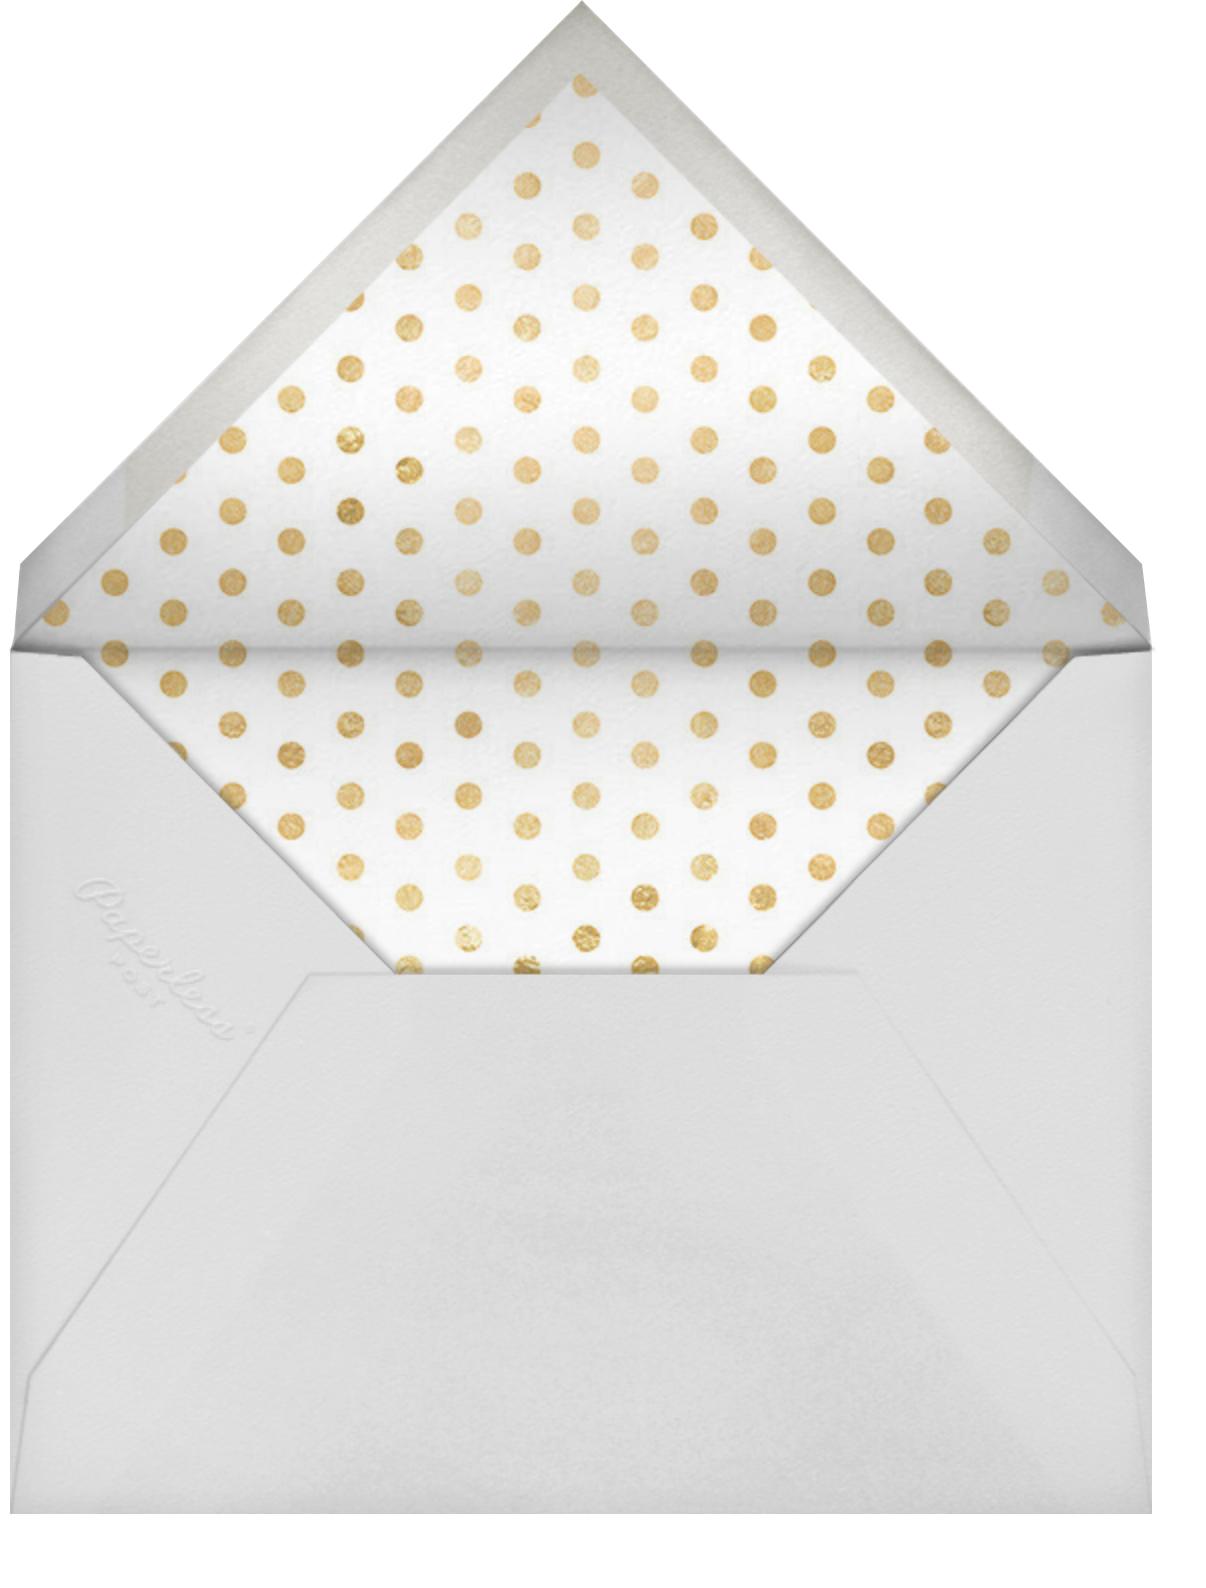 Lucky Number - Thirteen - kate spade new york - Bar and bat mitzvah - envelope back